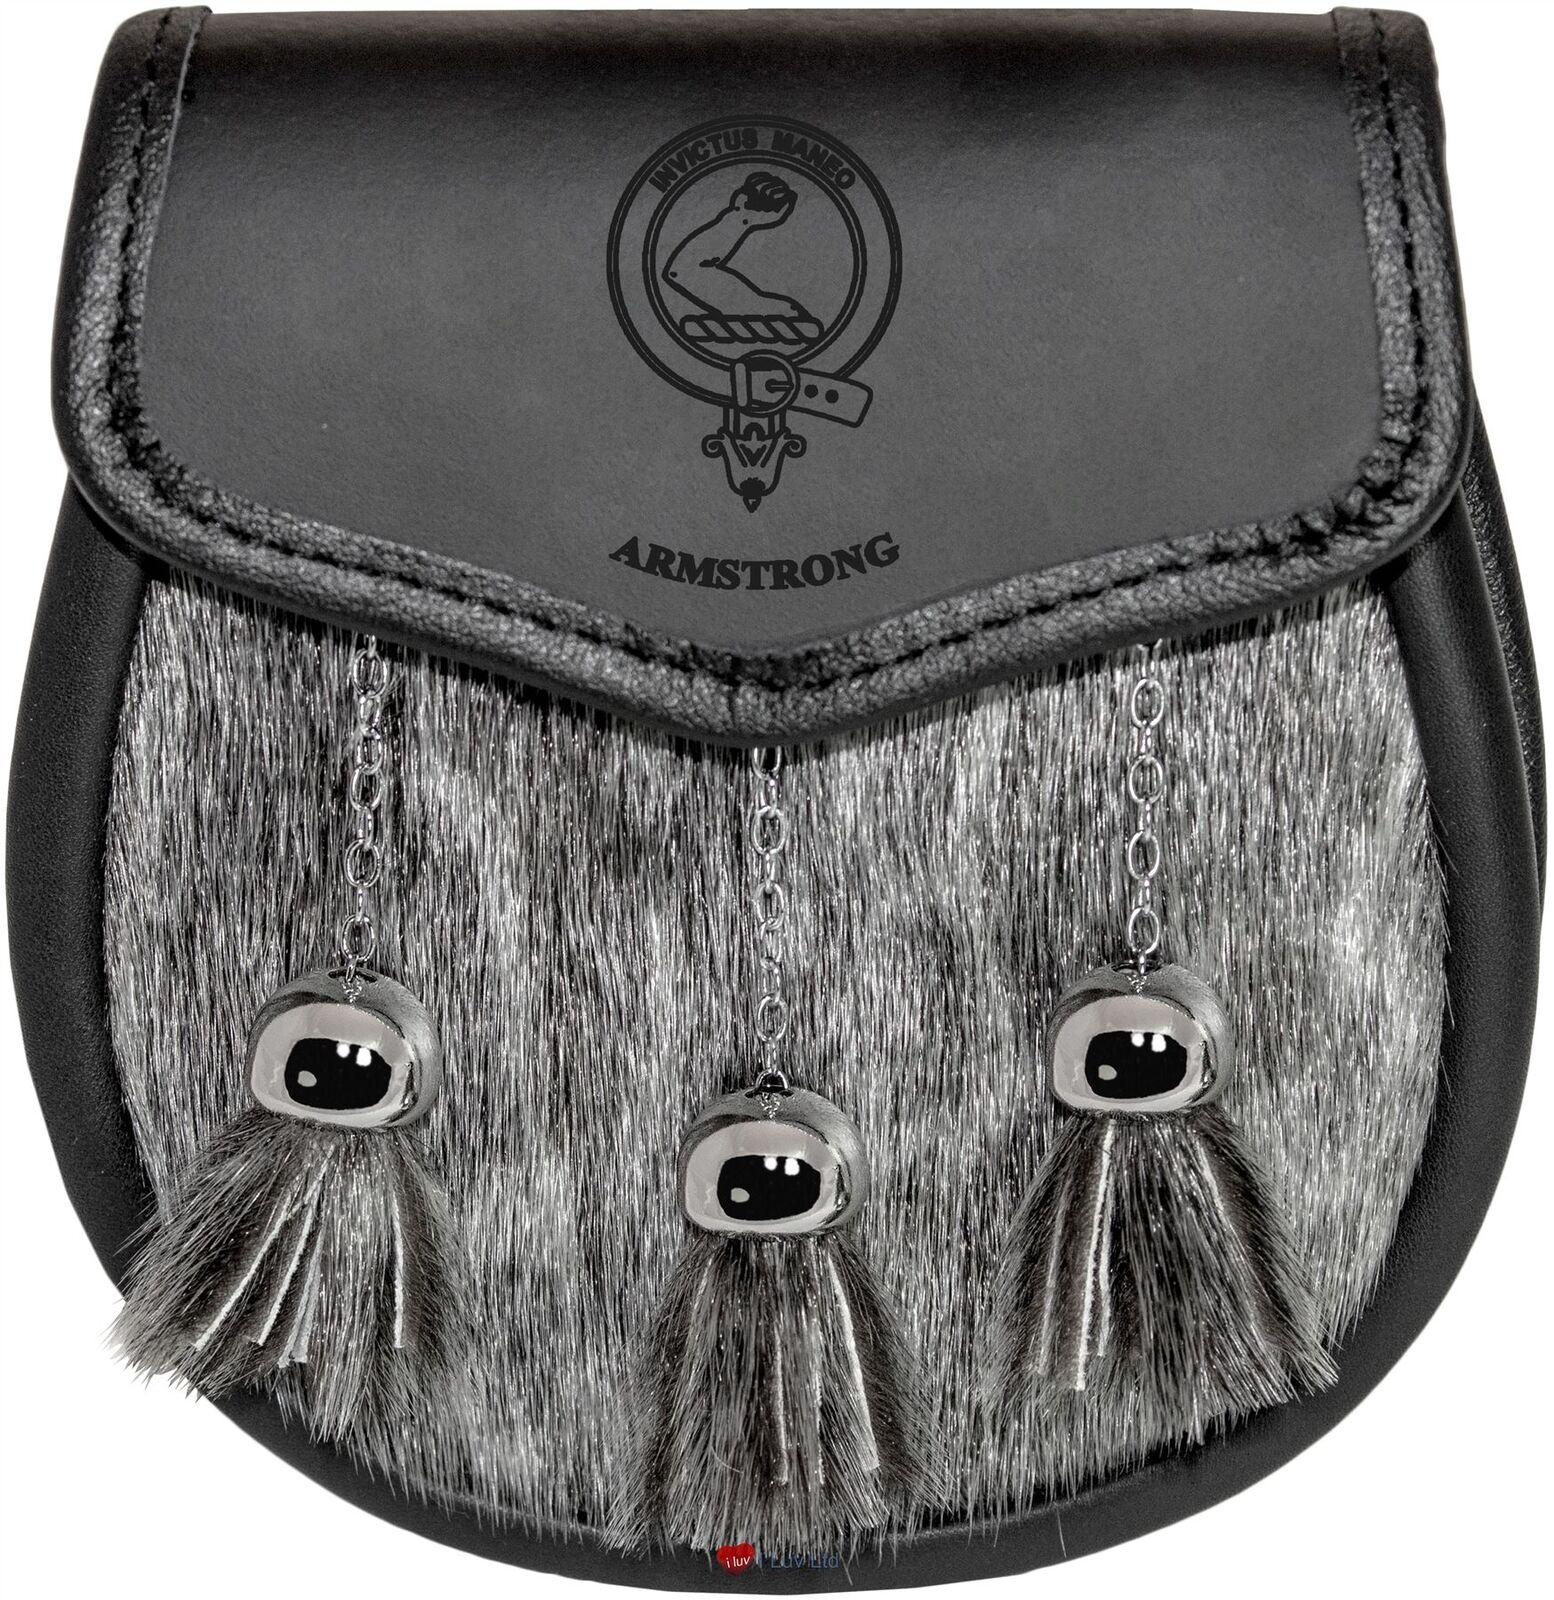 Armstrong Semi Sporran Fur Plain Leather Flap Scottish Clan Crest